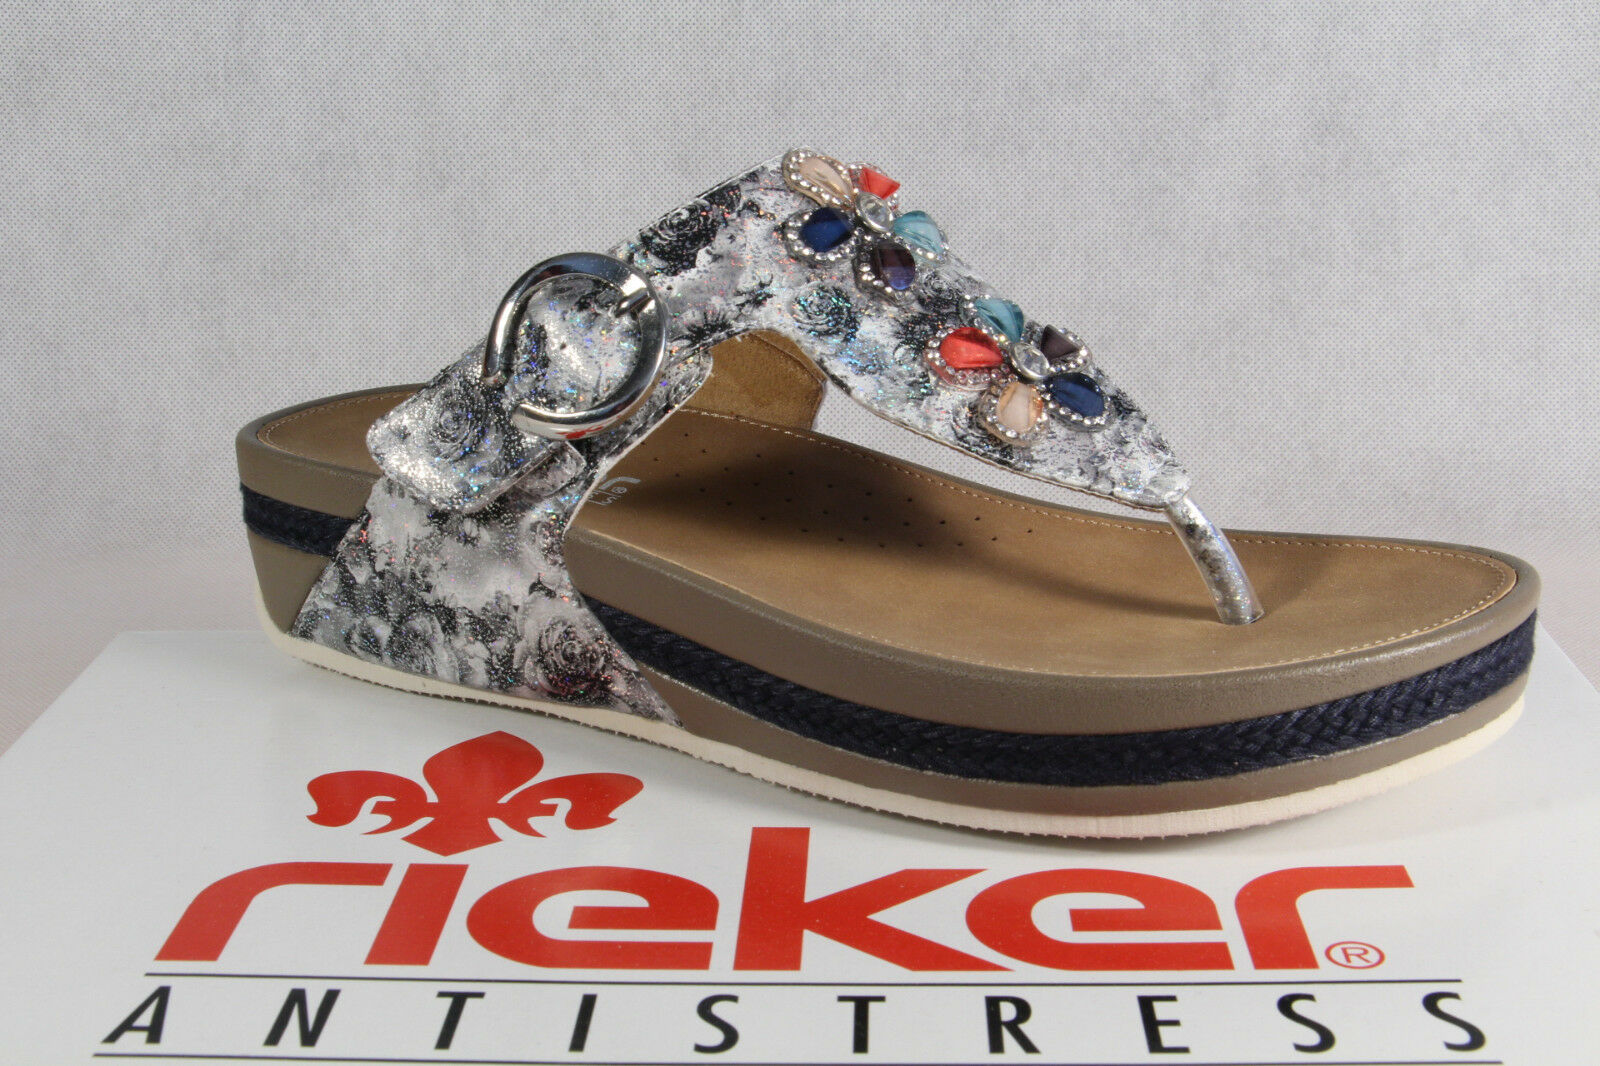 Rieker Donna dita dei piedi STEG Sandali Sandali Sandalo Sandali v1481 GRIGIO NUOVO!